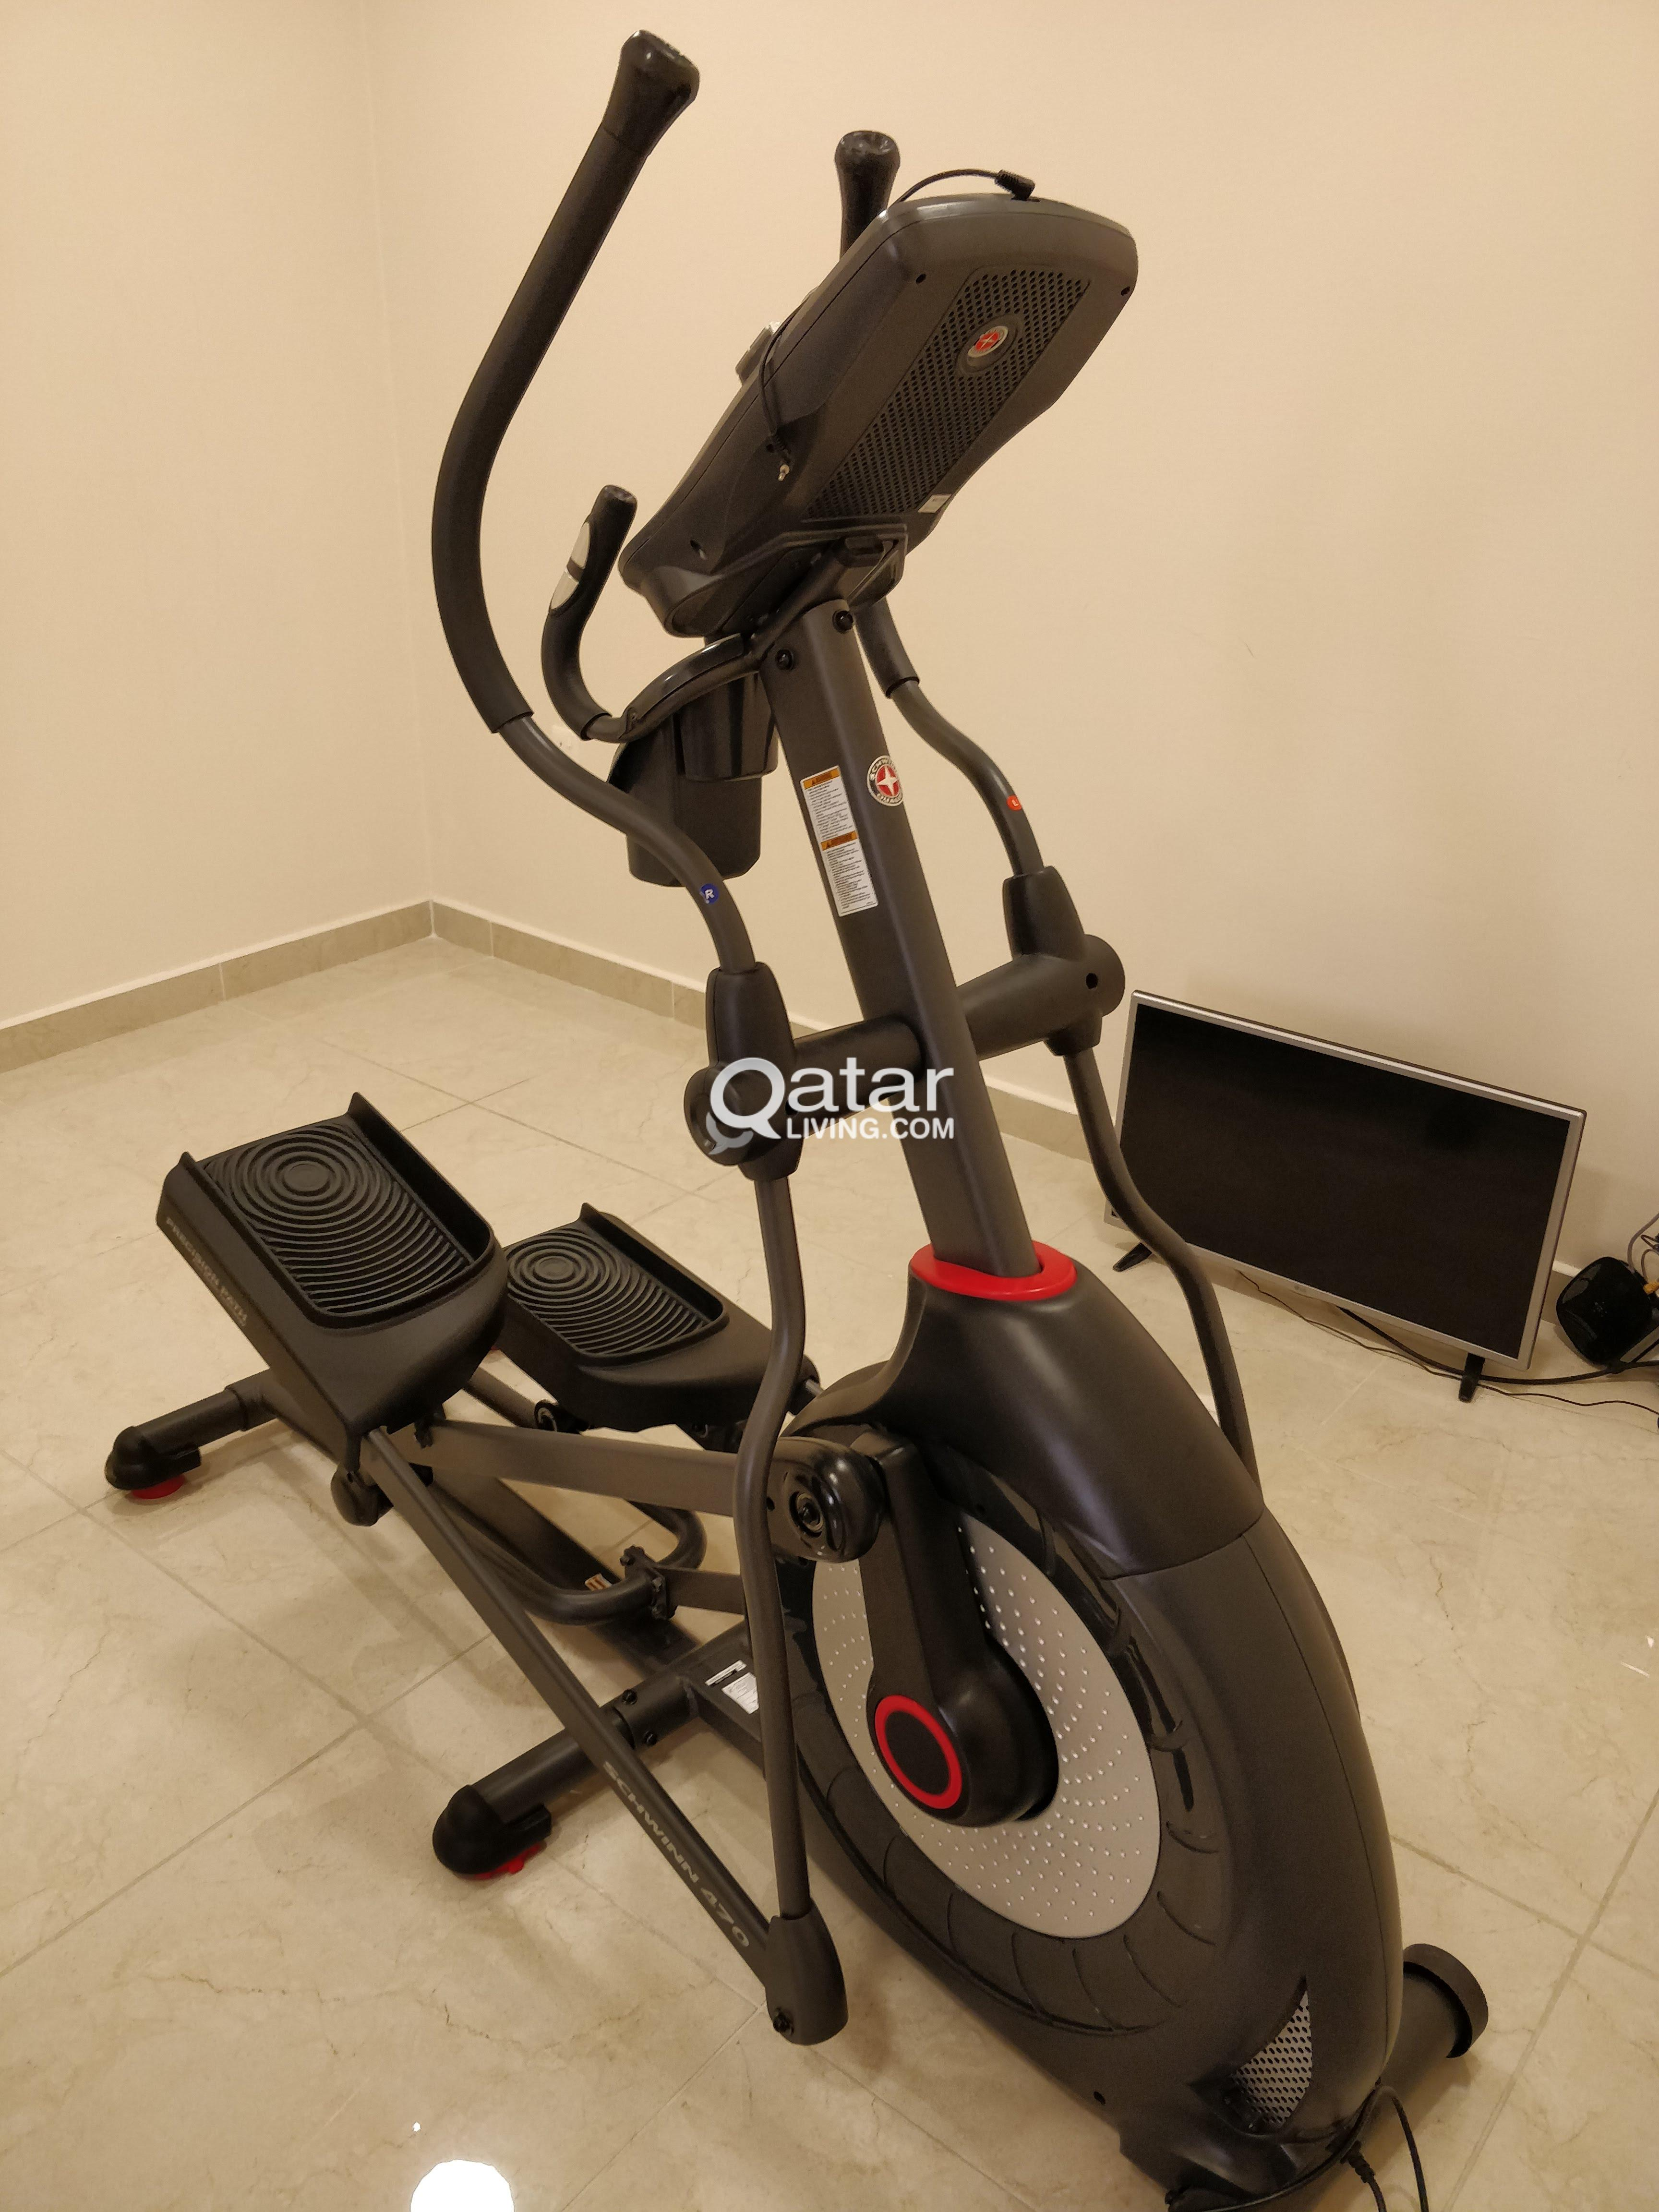 aa10cb933ac Schwinn 470 Elliptical Machine | Qatar Living